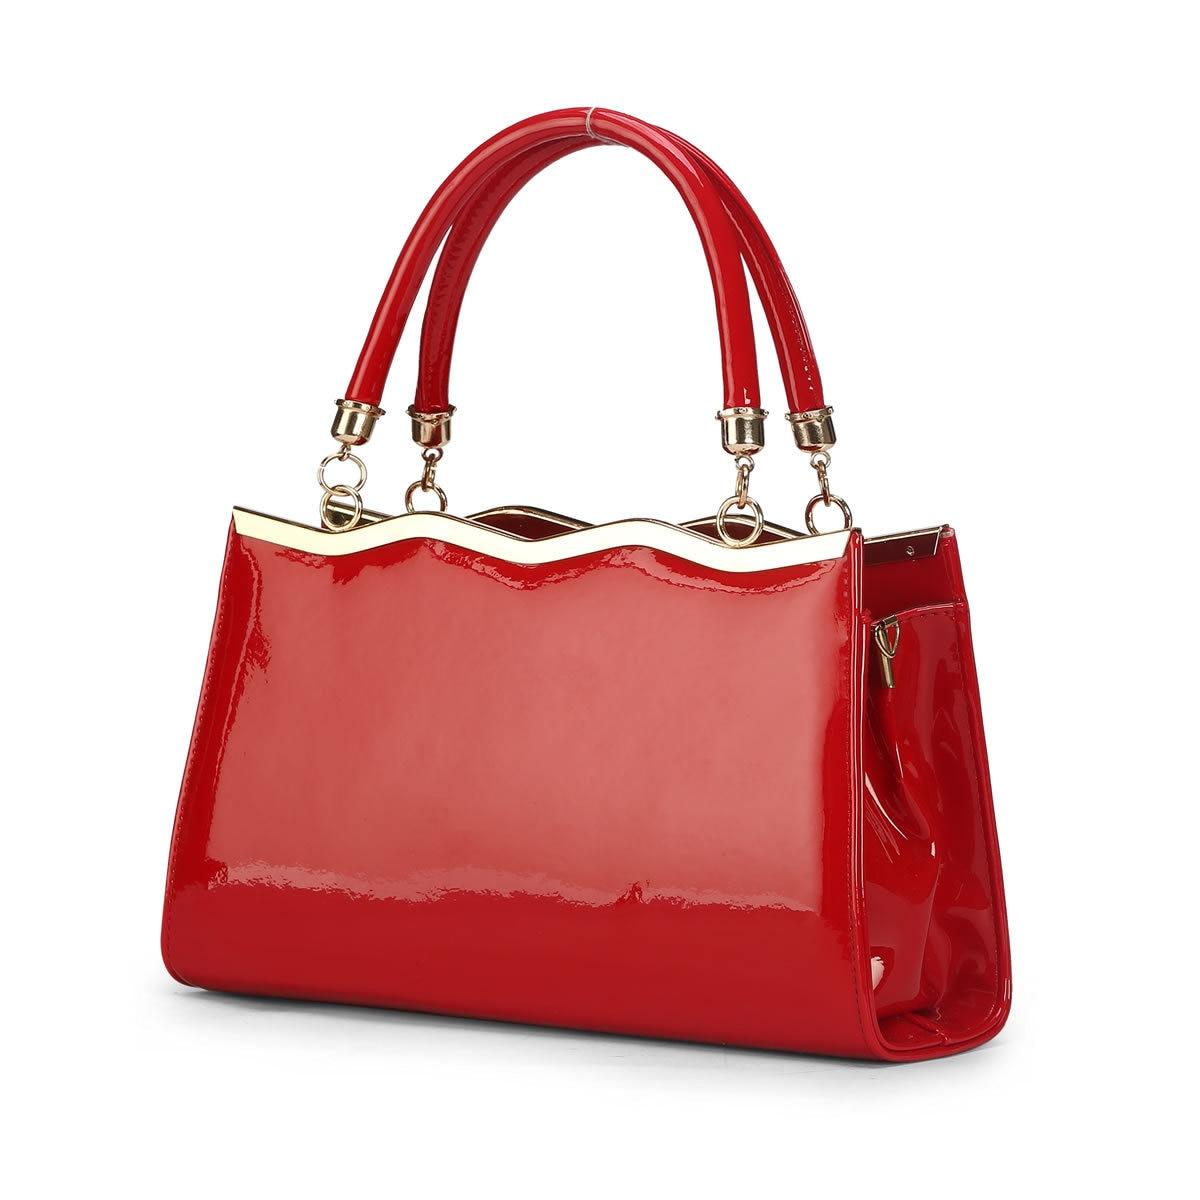 2016 Limited Rushed Beauty Package Personalized Handbag Classic Wedding font b Bridesmaid b font font b